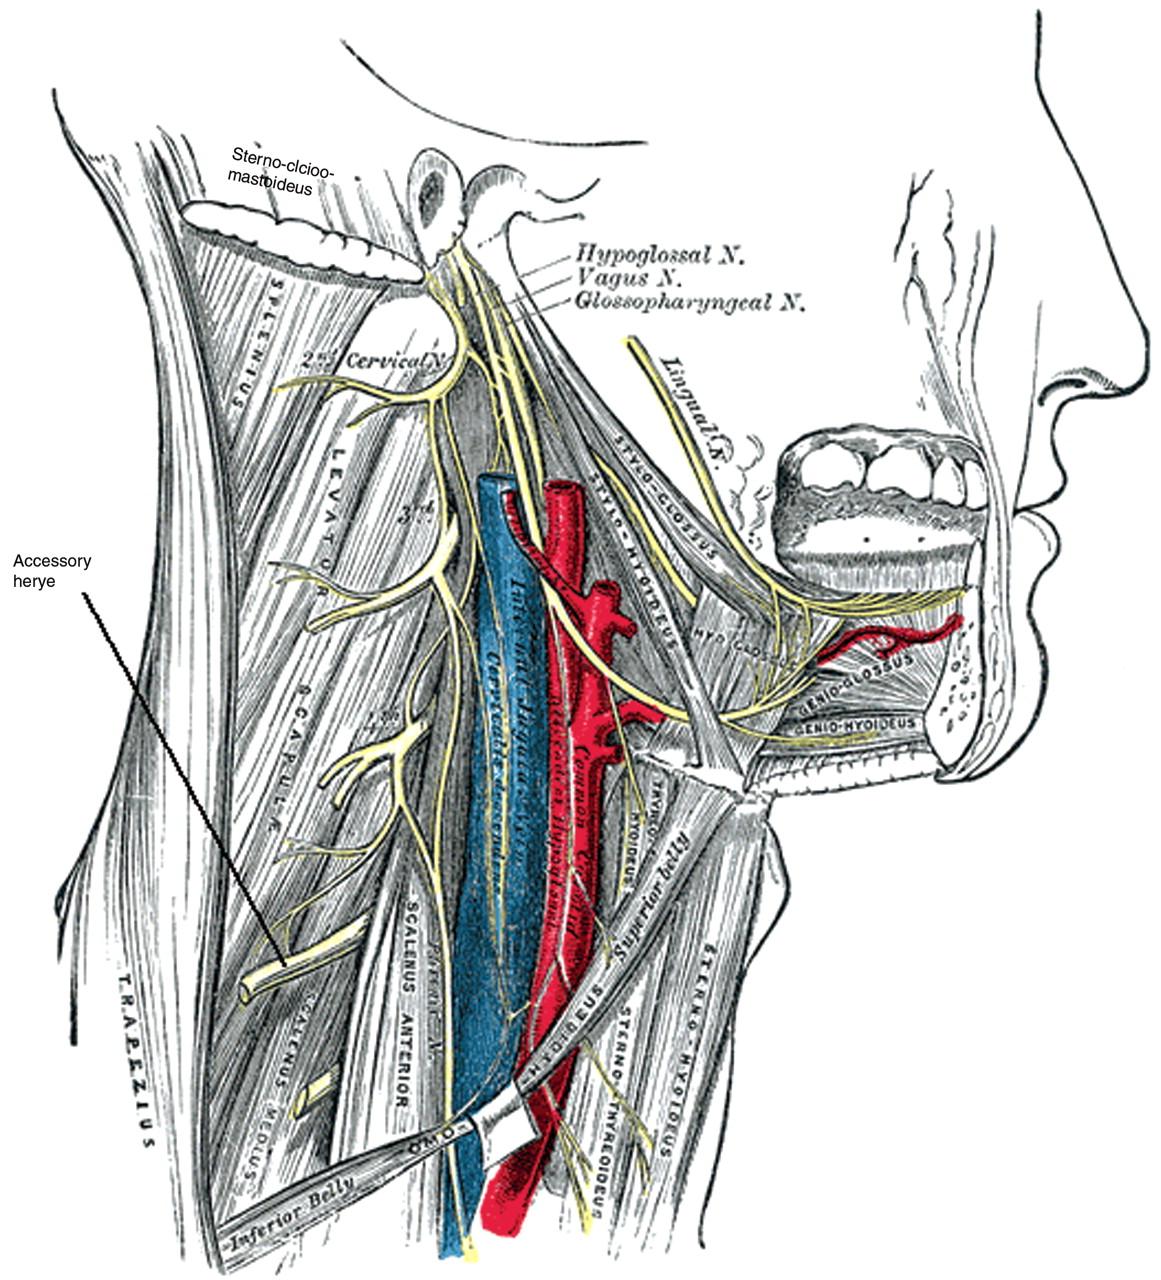 Accessory nerve palsies | Practical Neurology